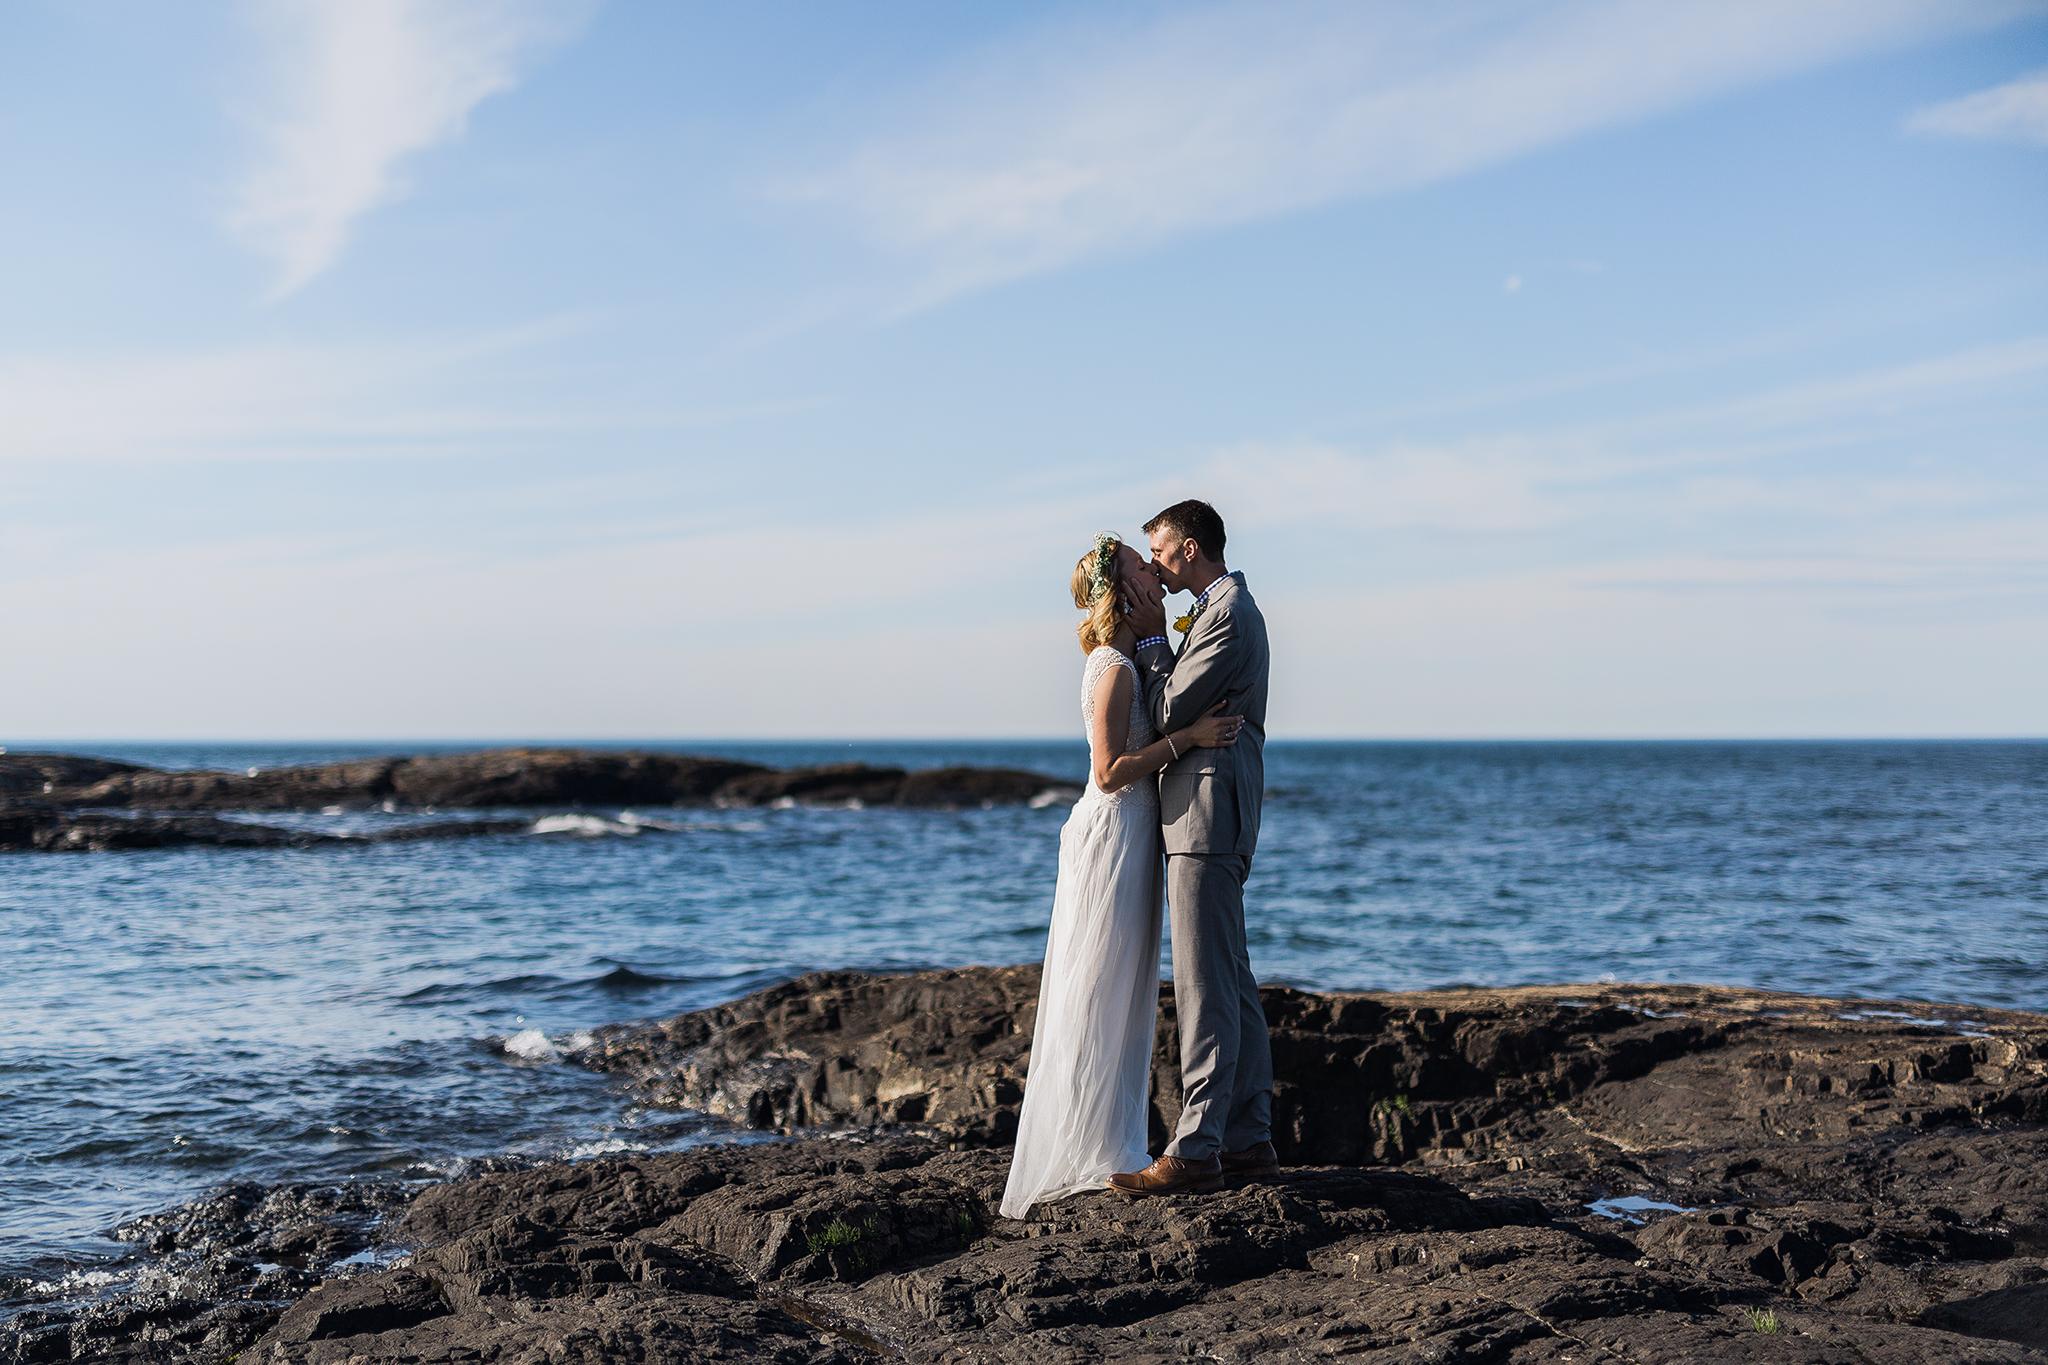 rockhill-studio-marquette-michigan-bride-groom-kissing-blackrocks-presque-isle.jpg